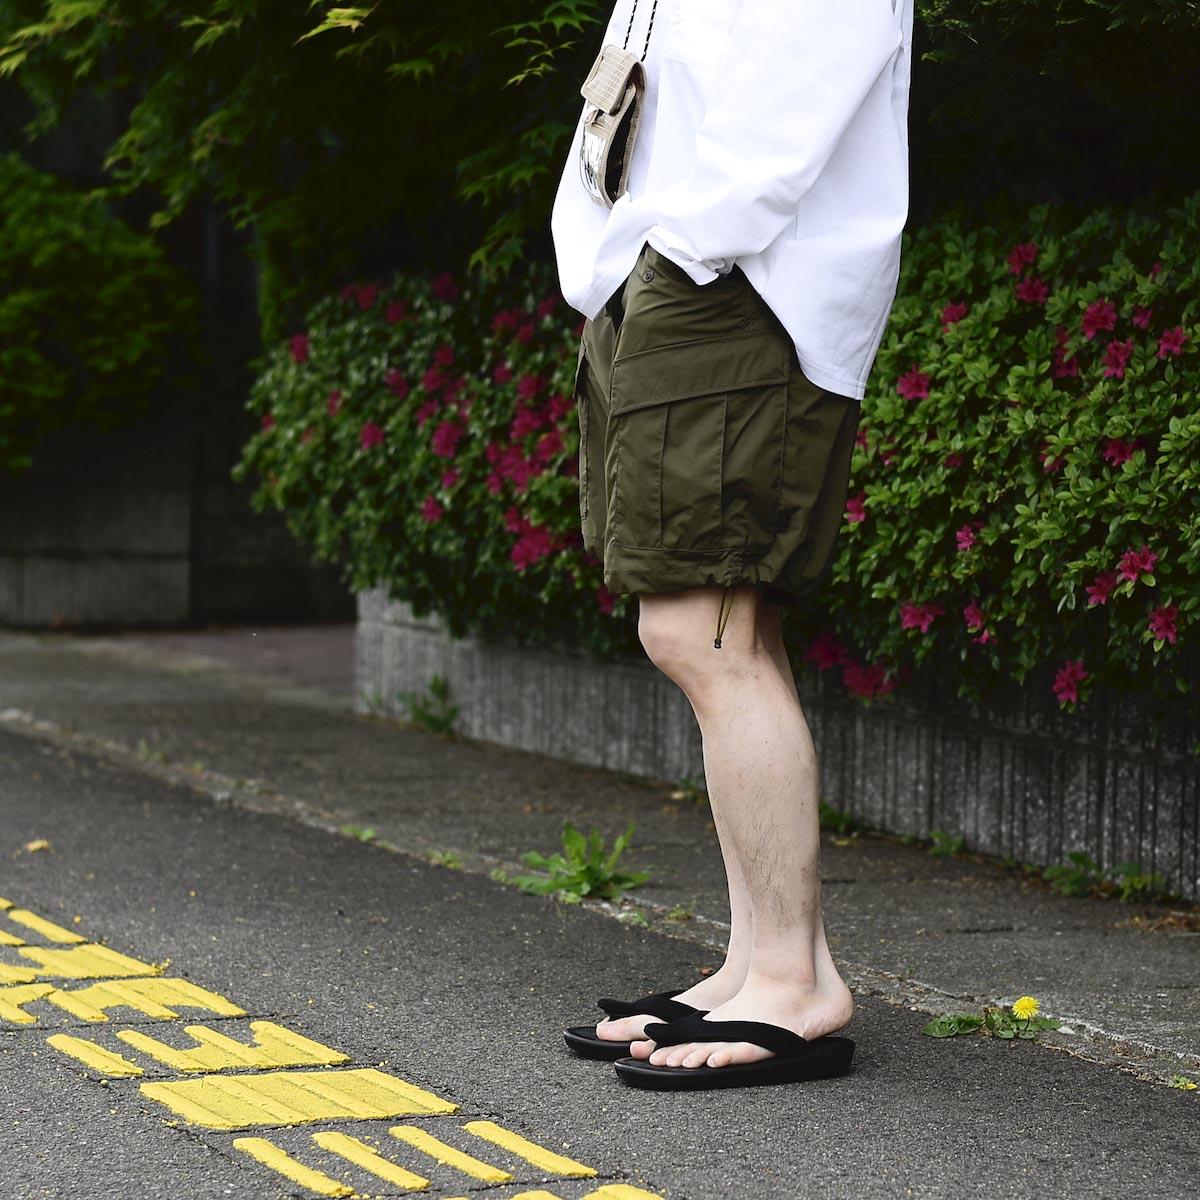 DAIWA PIER39 / Micro Rip-Stop Easy 6P Shorts (Dark Olive) 着用イメージ (162cm Msize)